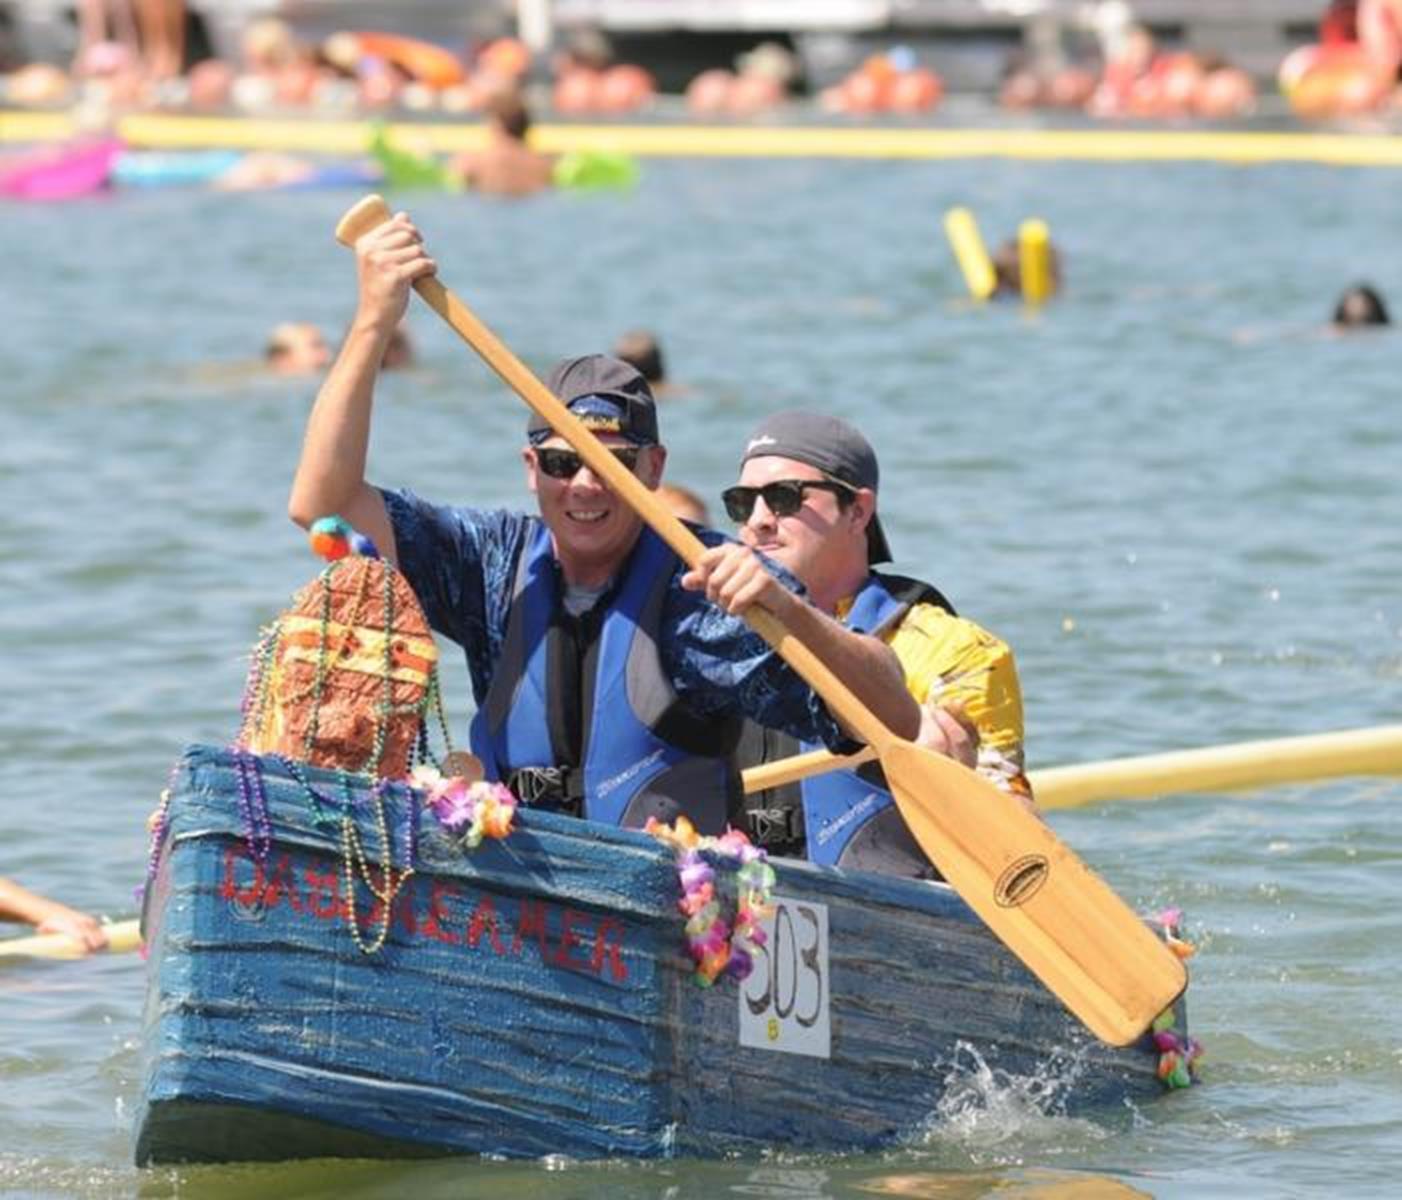 Racers at the Cardboard Boat Races. Credit: Heber Springs.